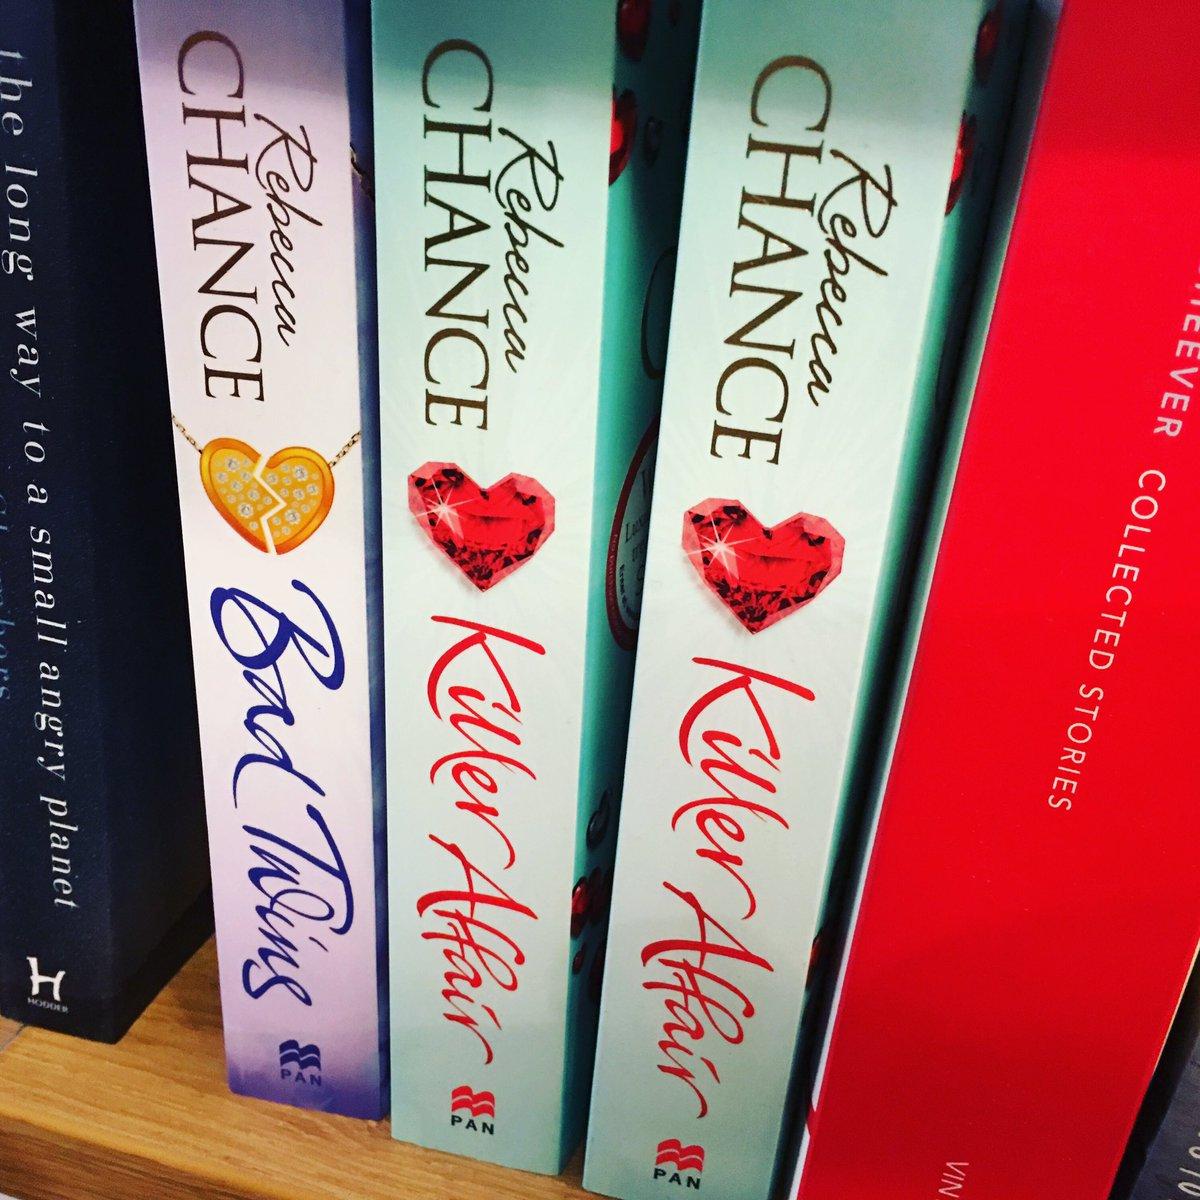 And a nice little stash of my books at #thebookshop #heathrowairport... @HeathrowAirport https://t.co/JQKElctXrX